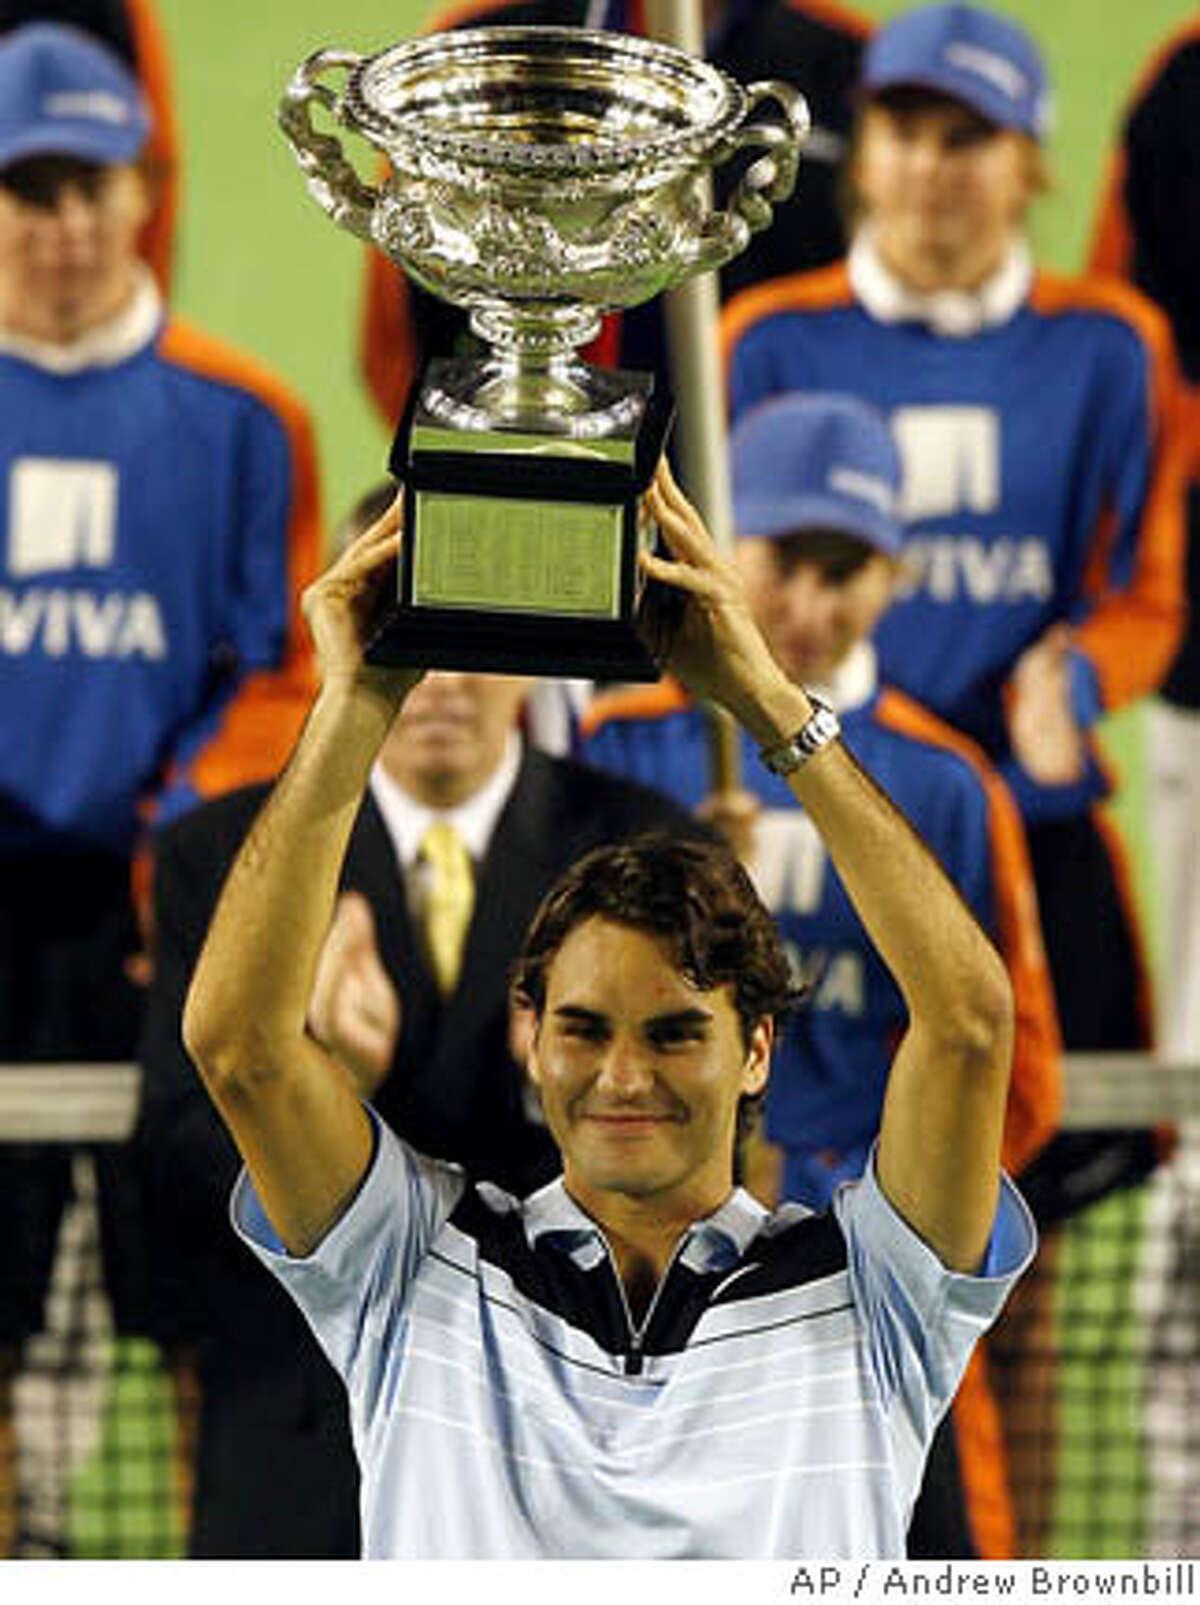 Switzerland's Roger Federer holds his trophy after winning the men's singles final against Chile's Fernando Gonzalez at the Australian Open tennis tournament in Melbourne, Australia, Sunday, Jan. 28, 2007. Federer won in straight sets 7-6 6-4 6-4. (AP Photo/Andrew Brownbill)